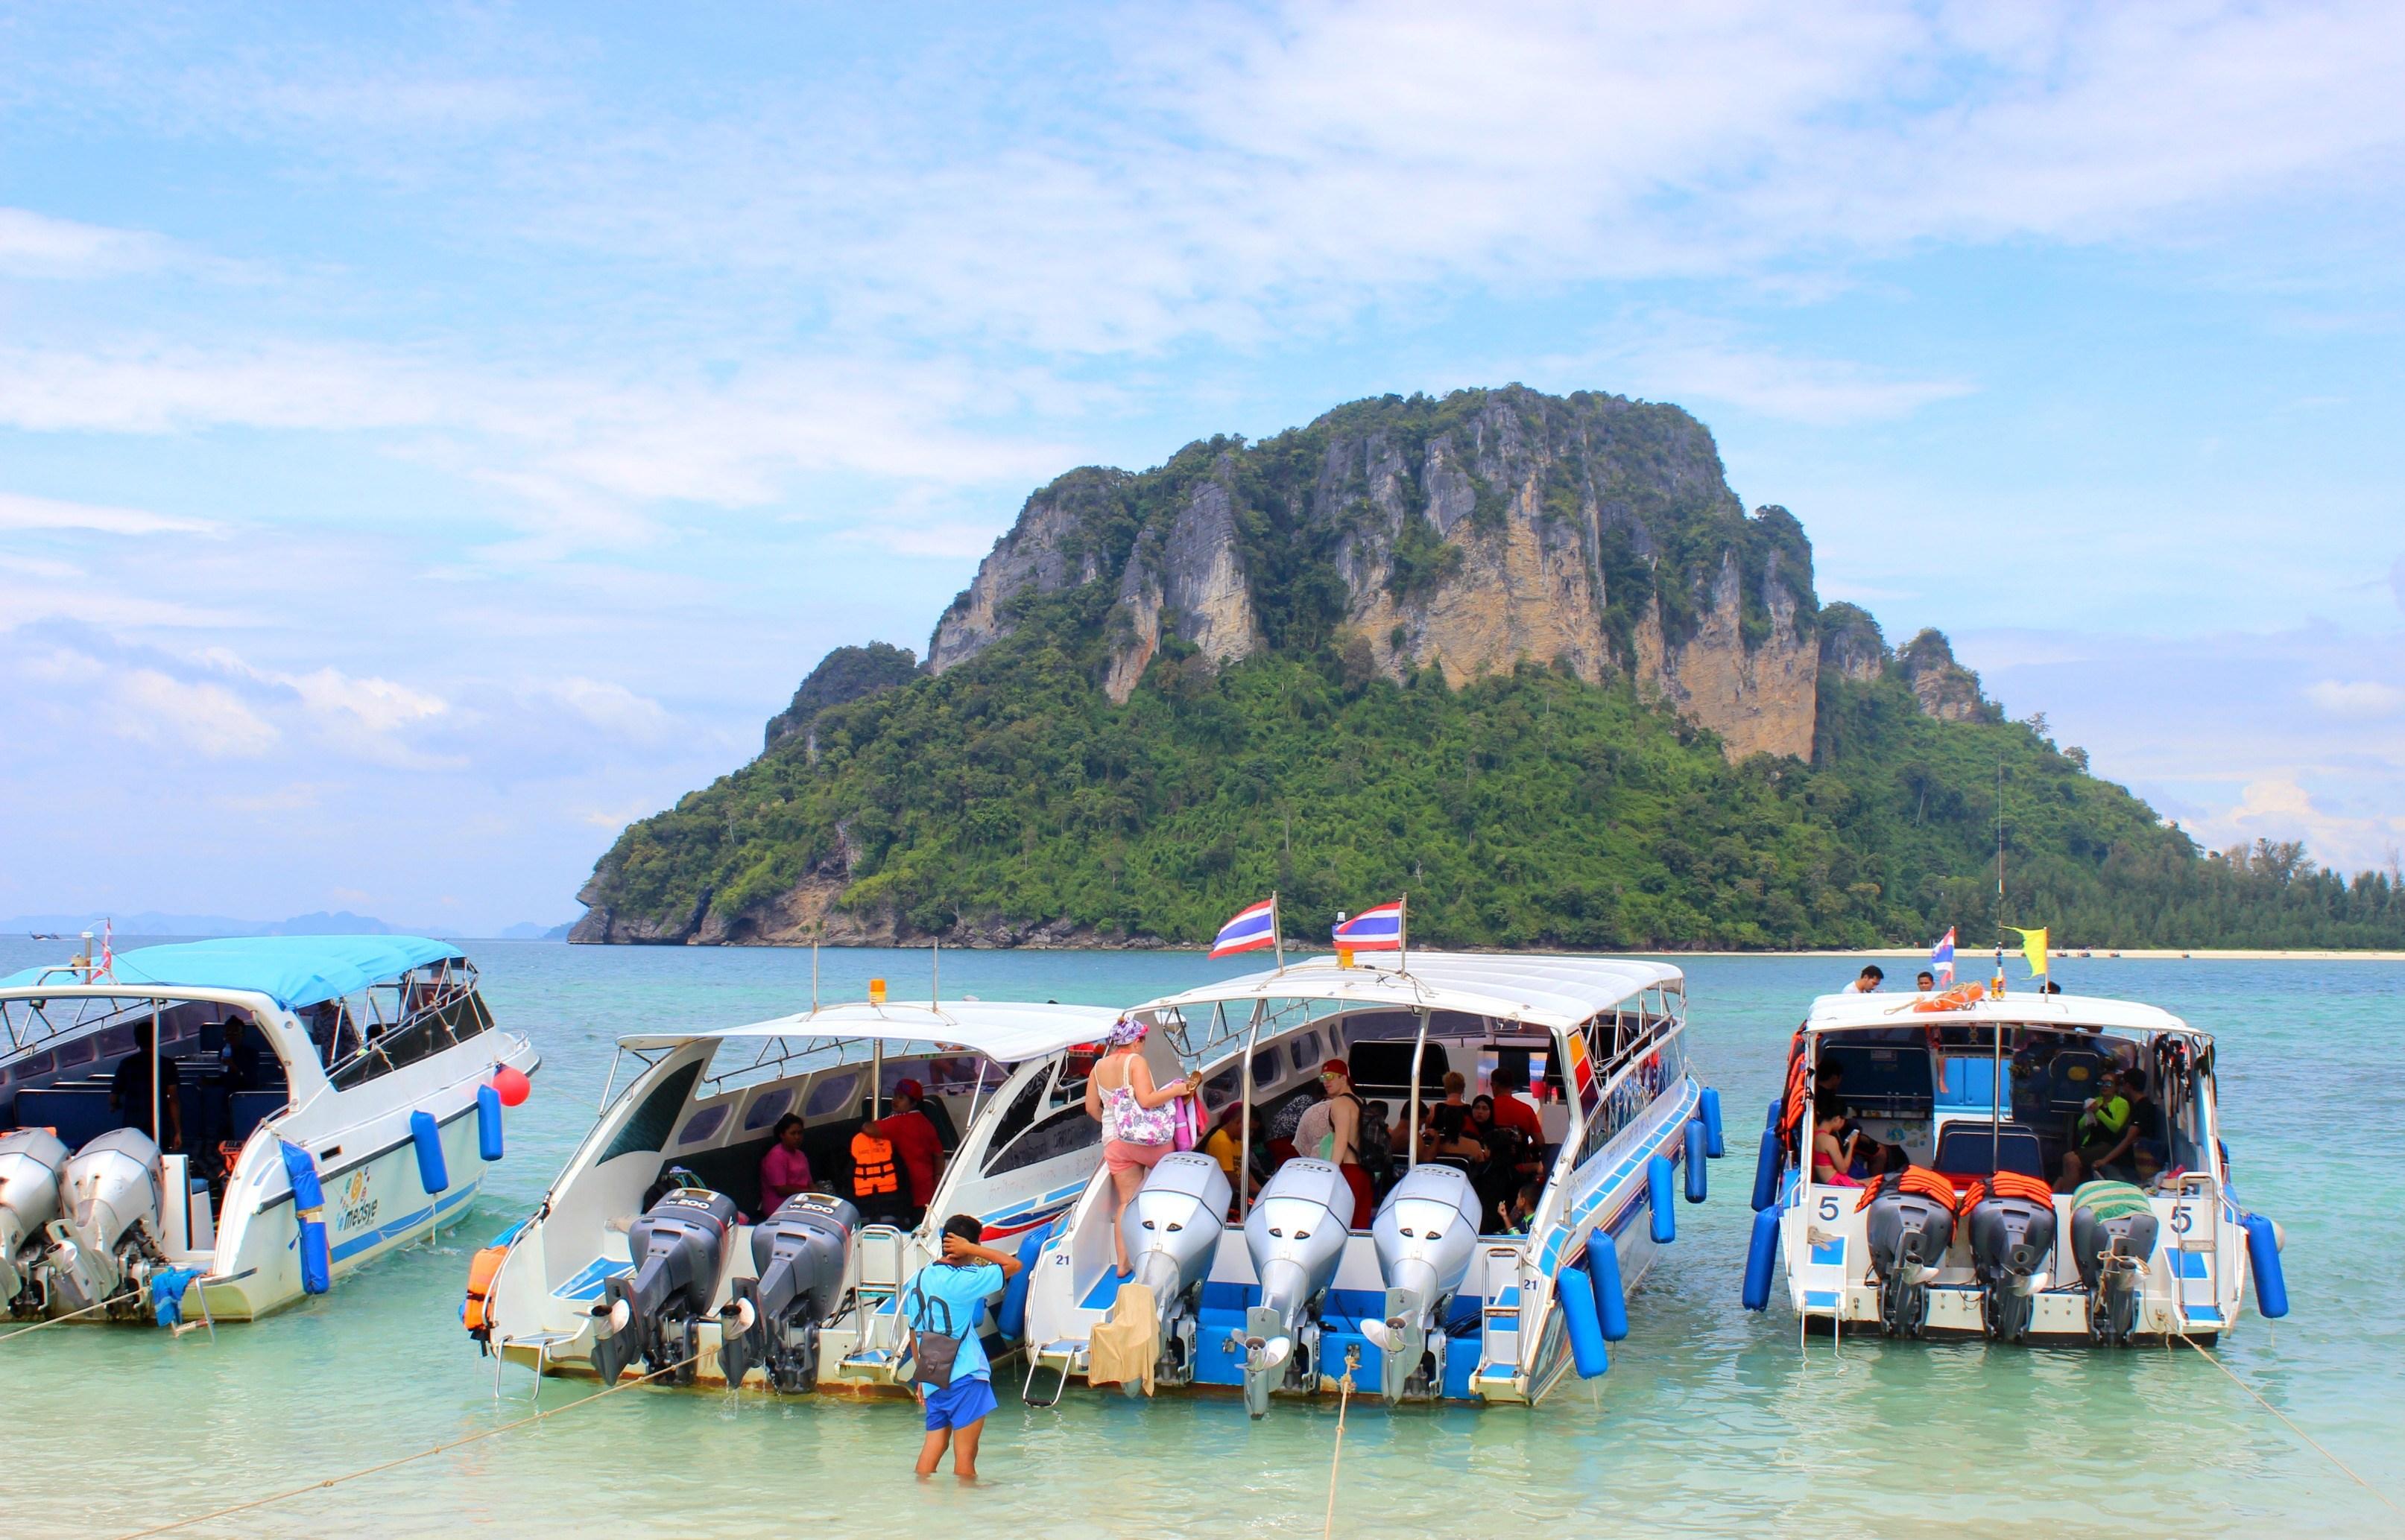 krabi 4 islands tour by speedboat